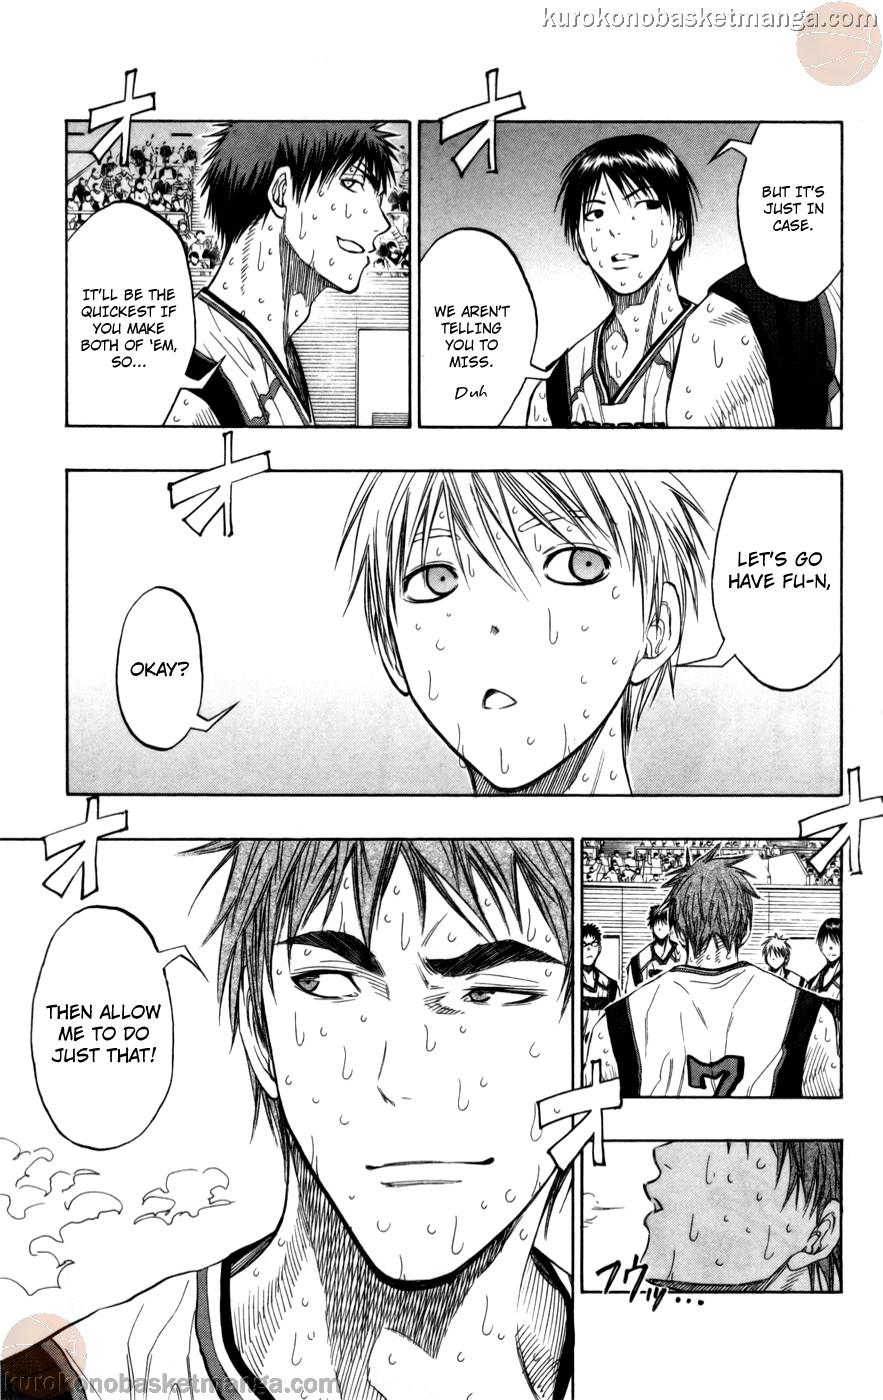 Kuroko no Basket Manga Chapter 92 - Image 09